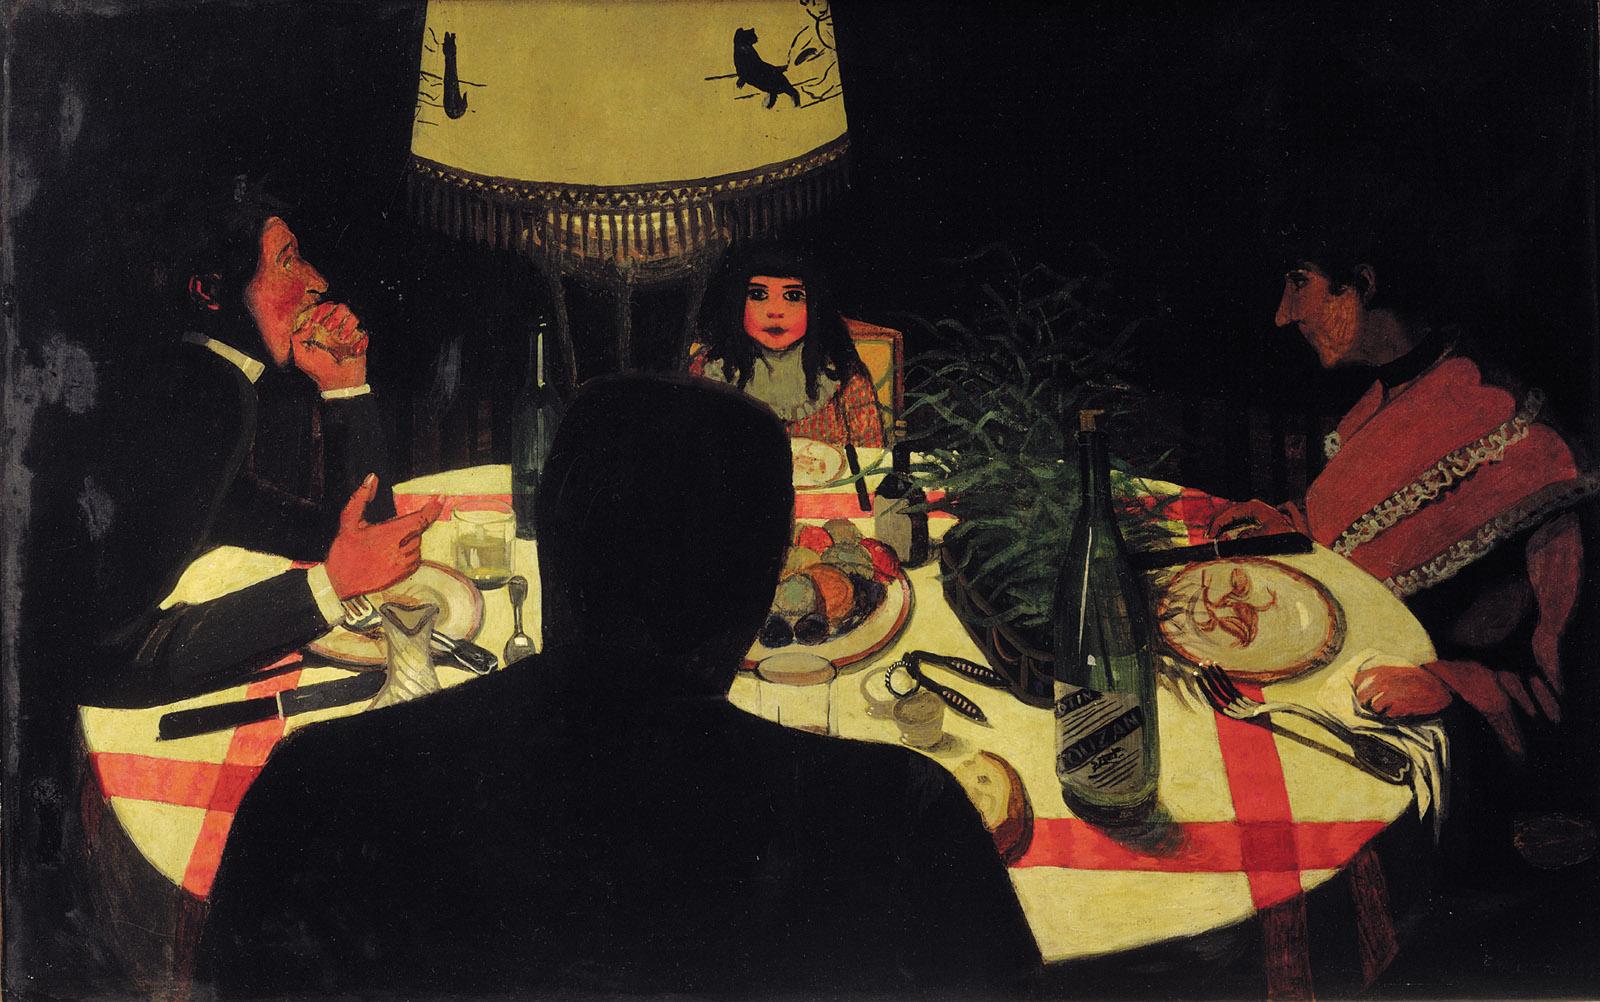 Dinner by Lamplight by Félix Vallotton